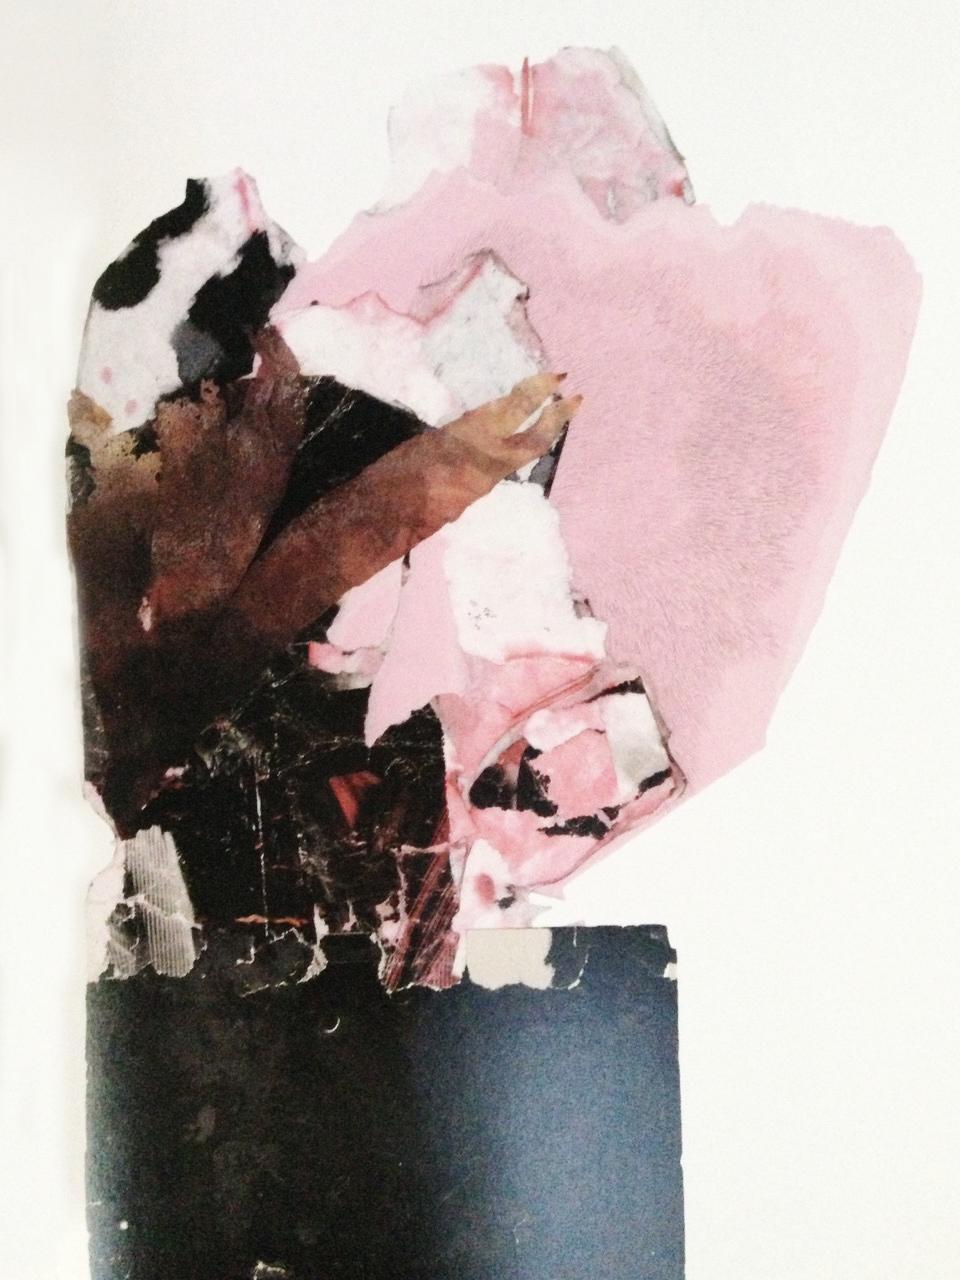 sunday_pink_sculpture_01.png